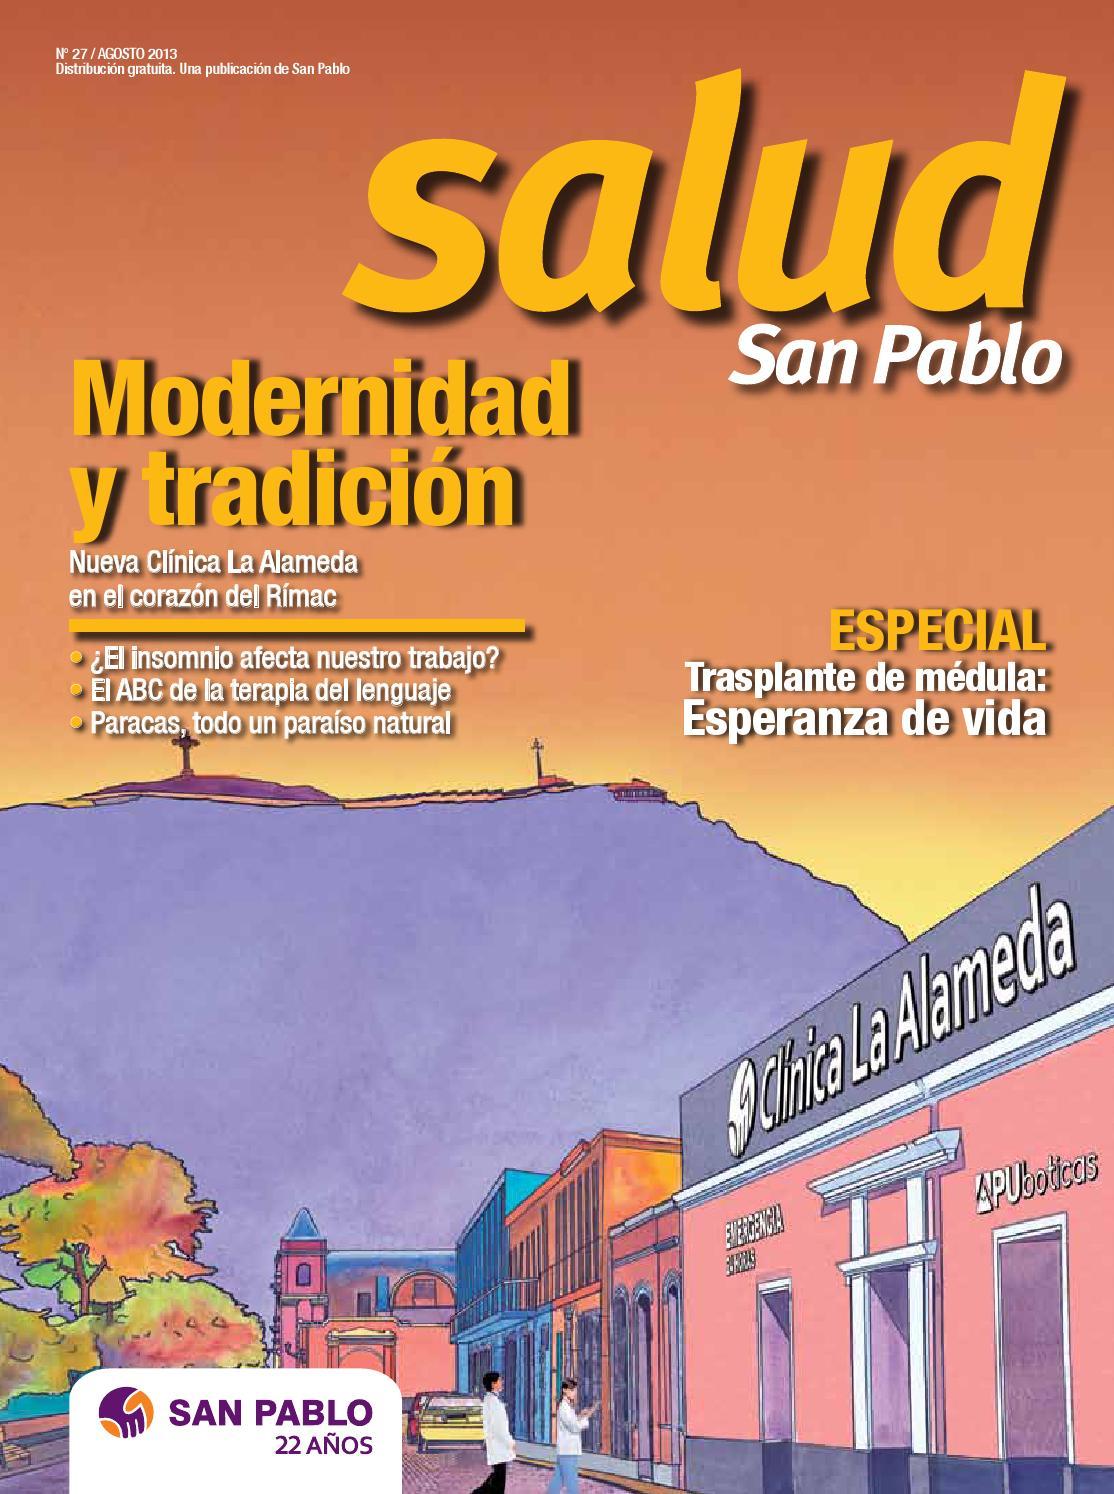 Revista Salud San Pablo N° 27 by San Pablo - issuu